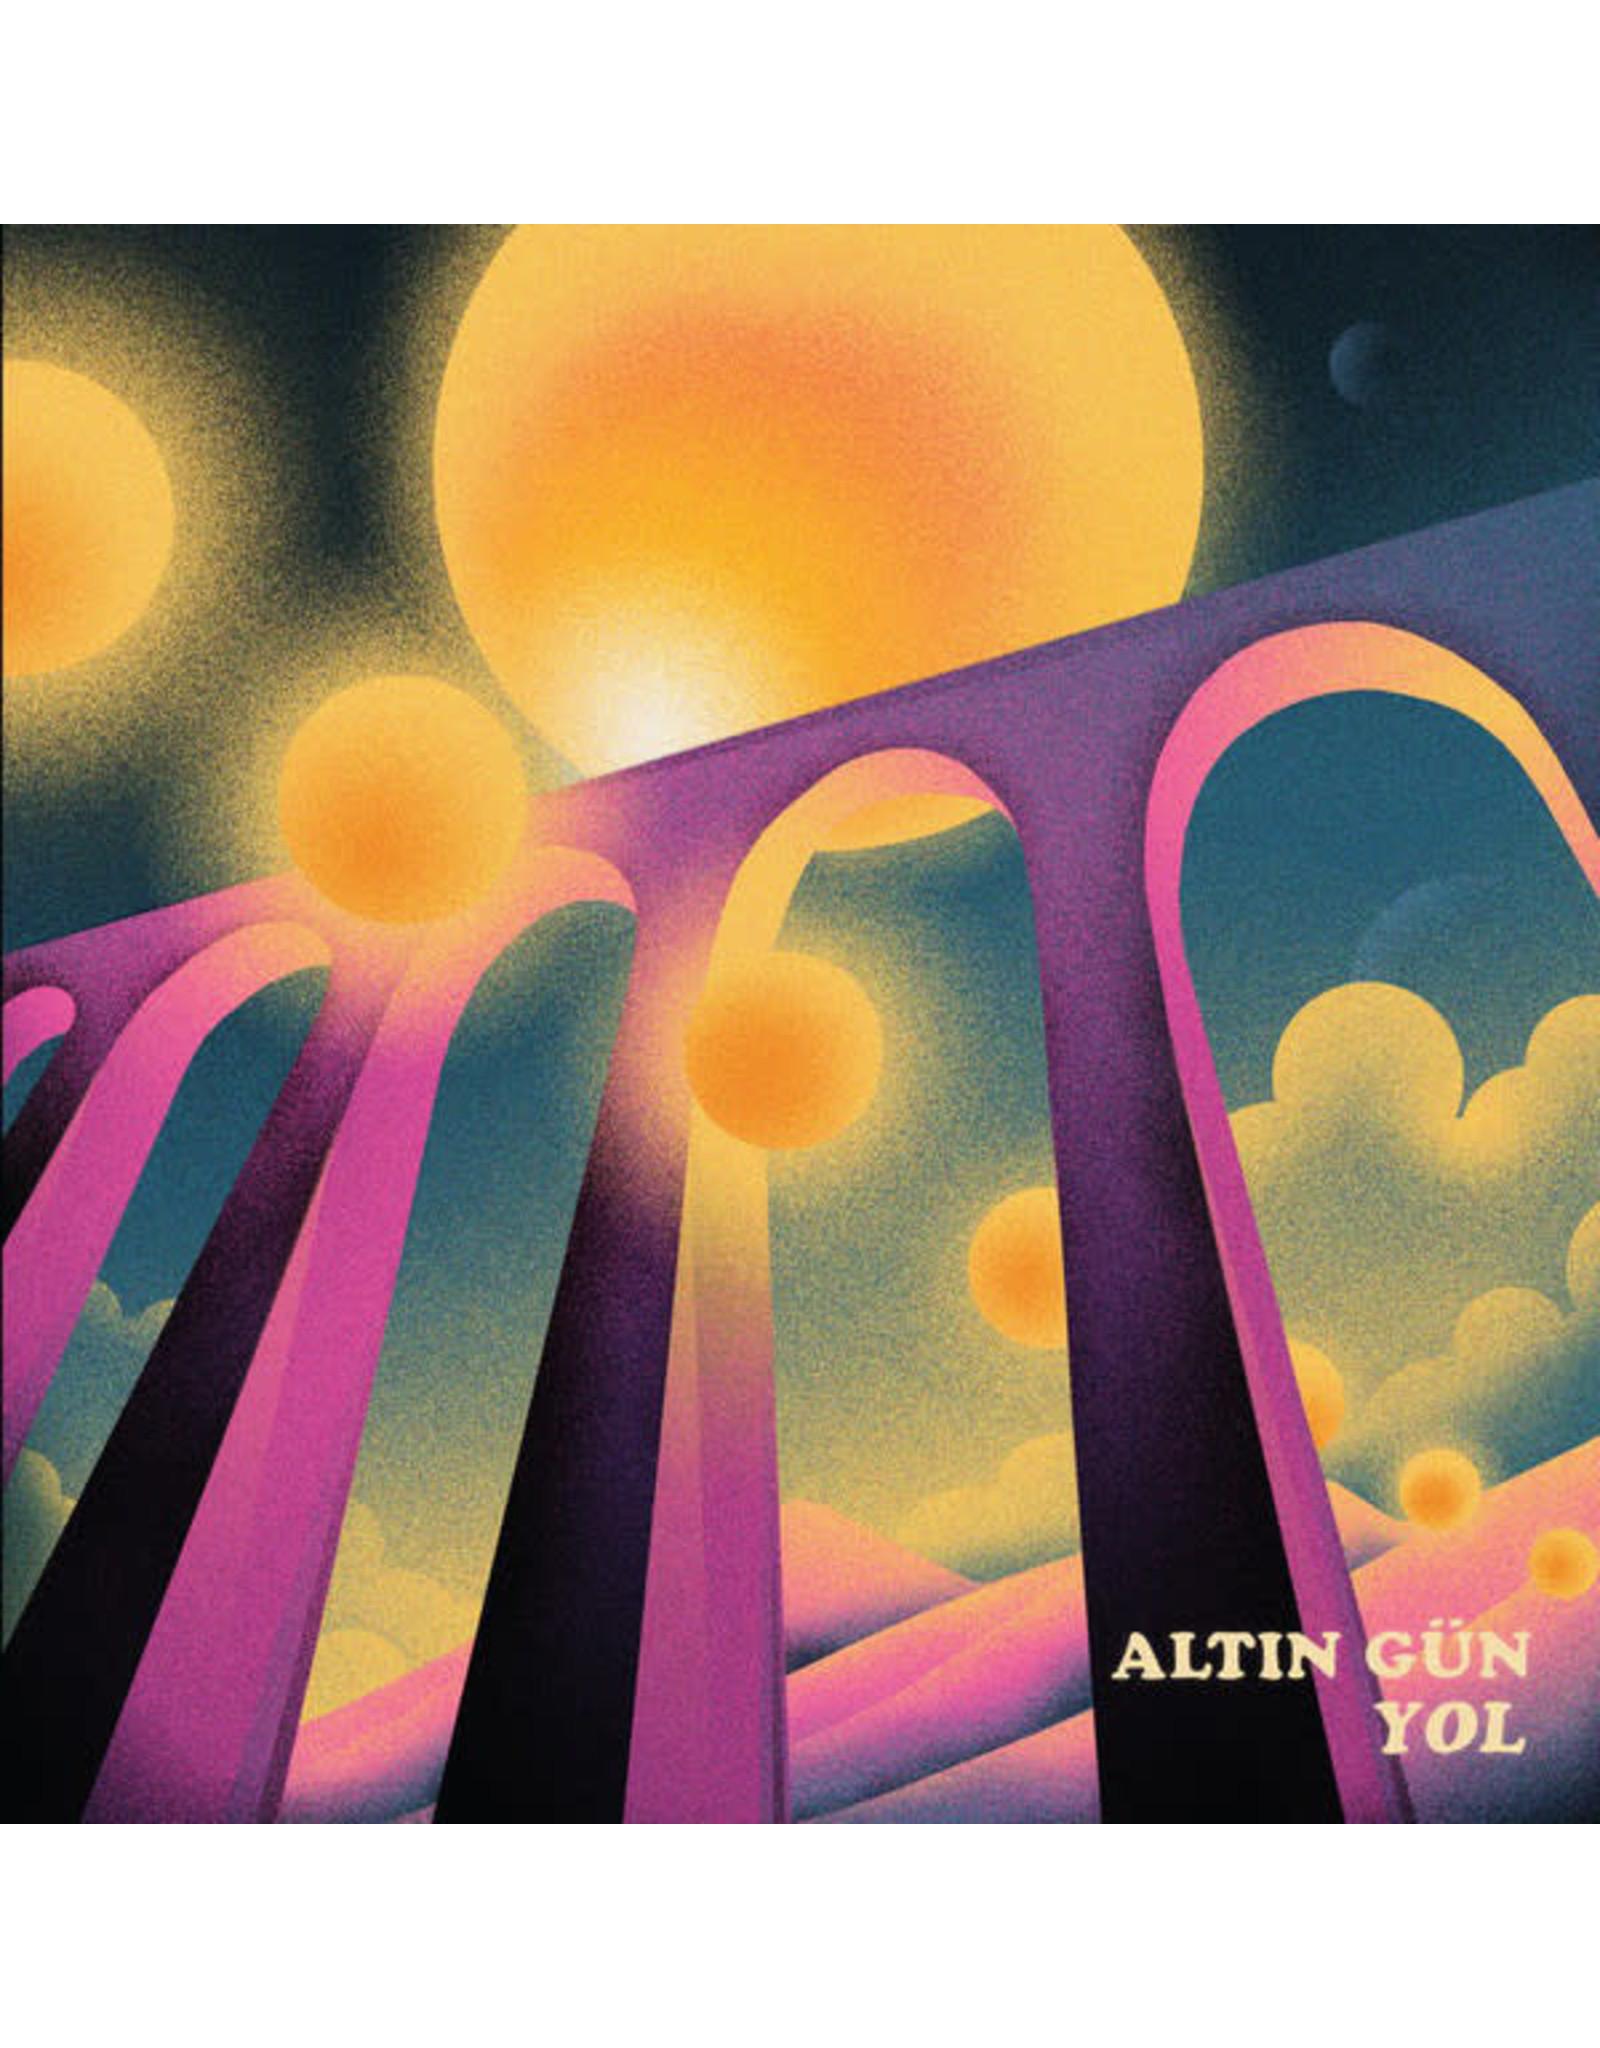 Altin Gun / Yol